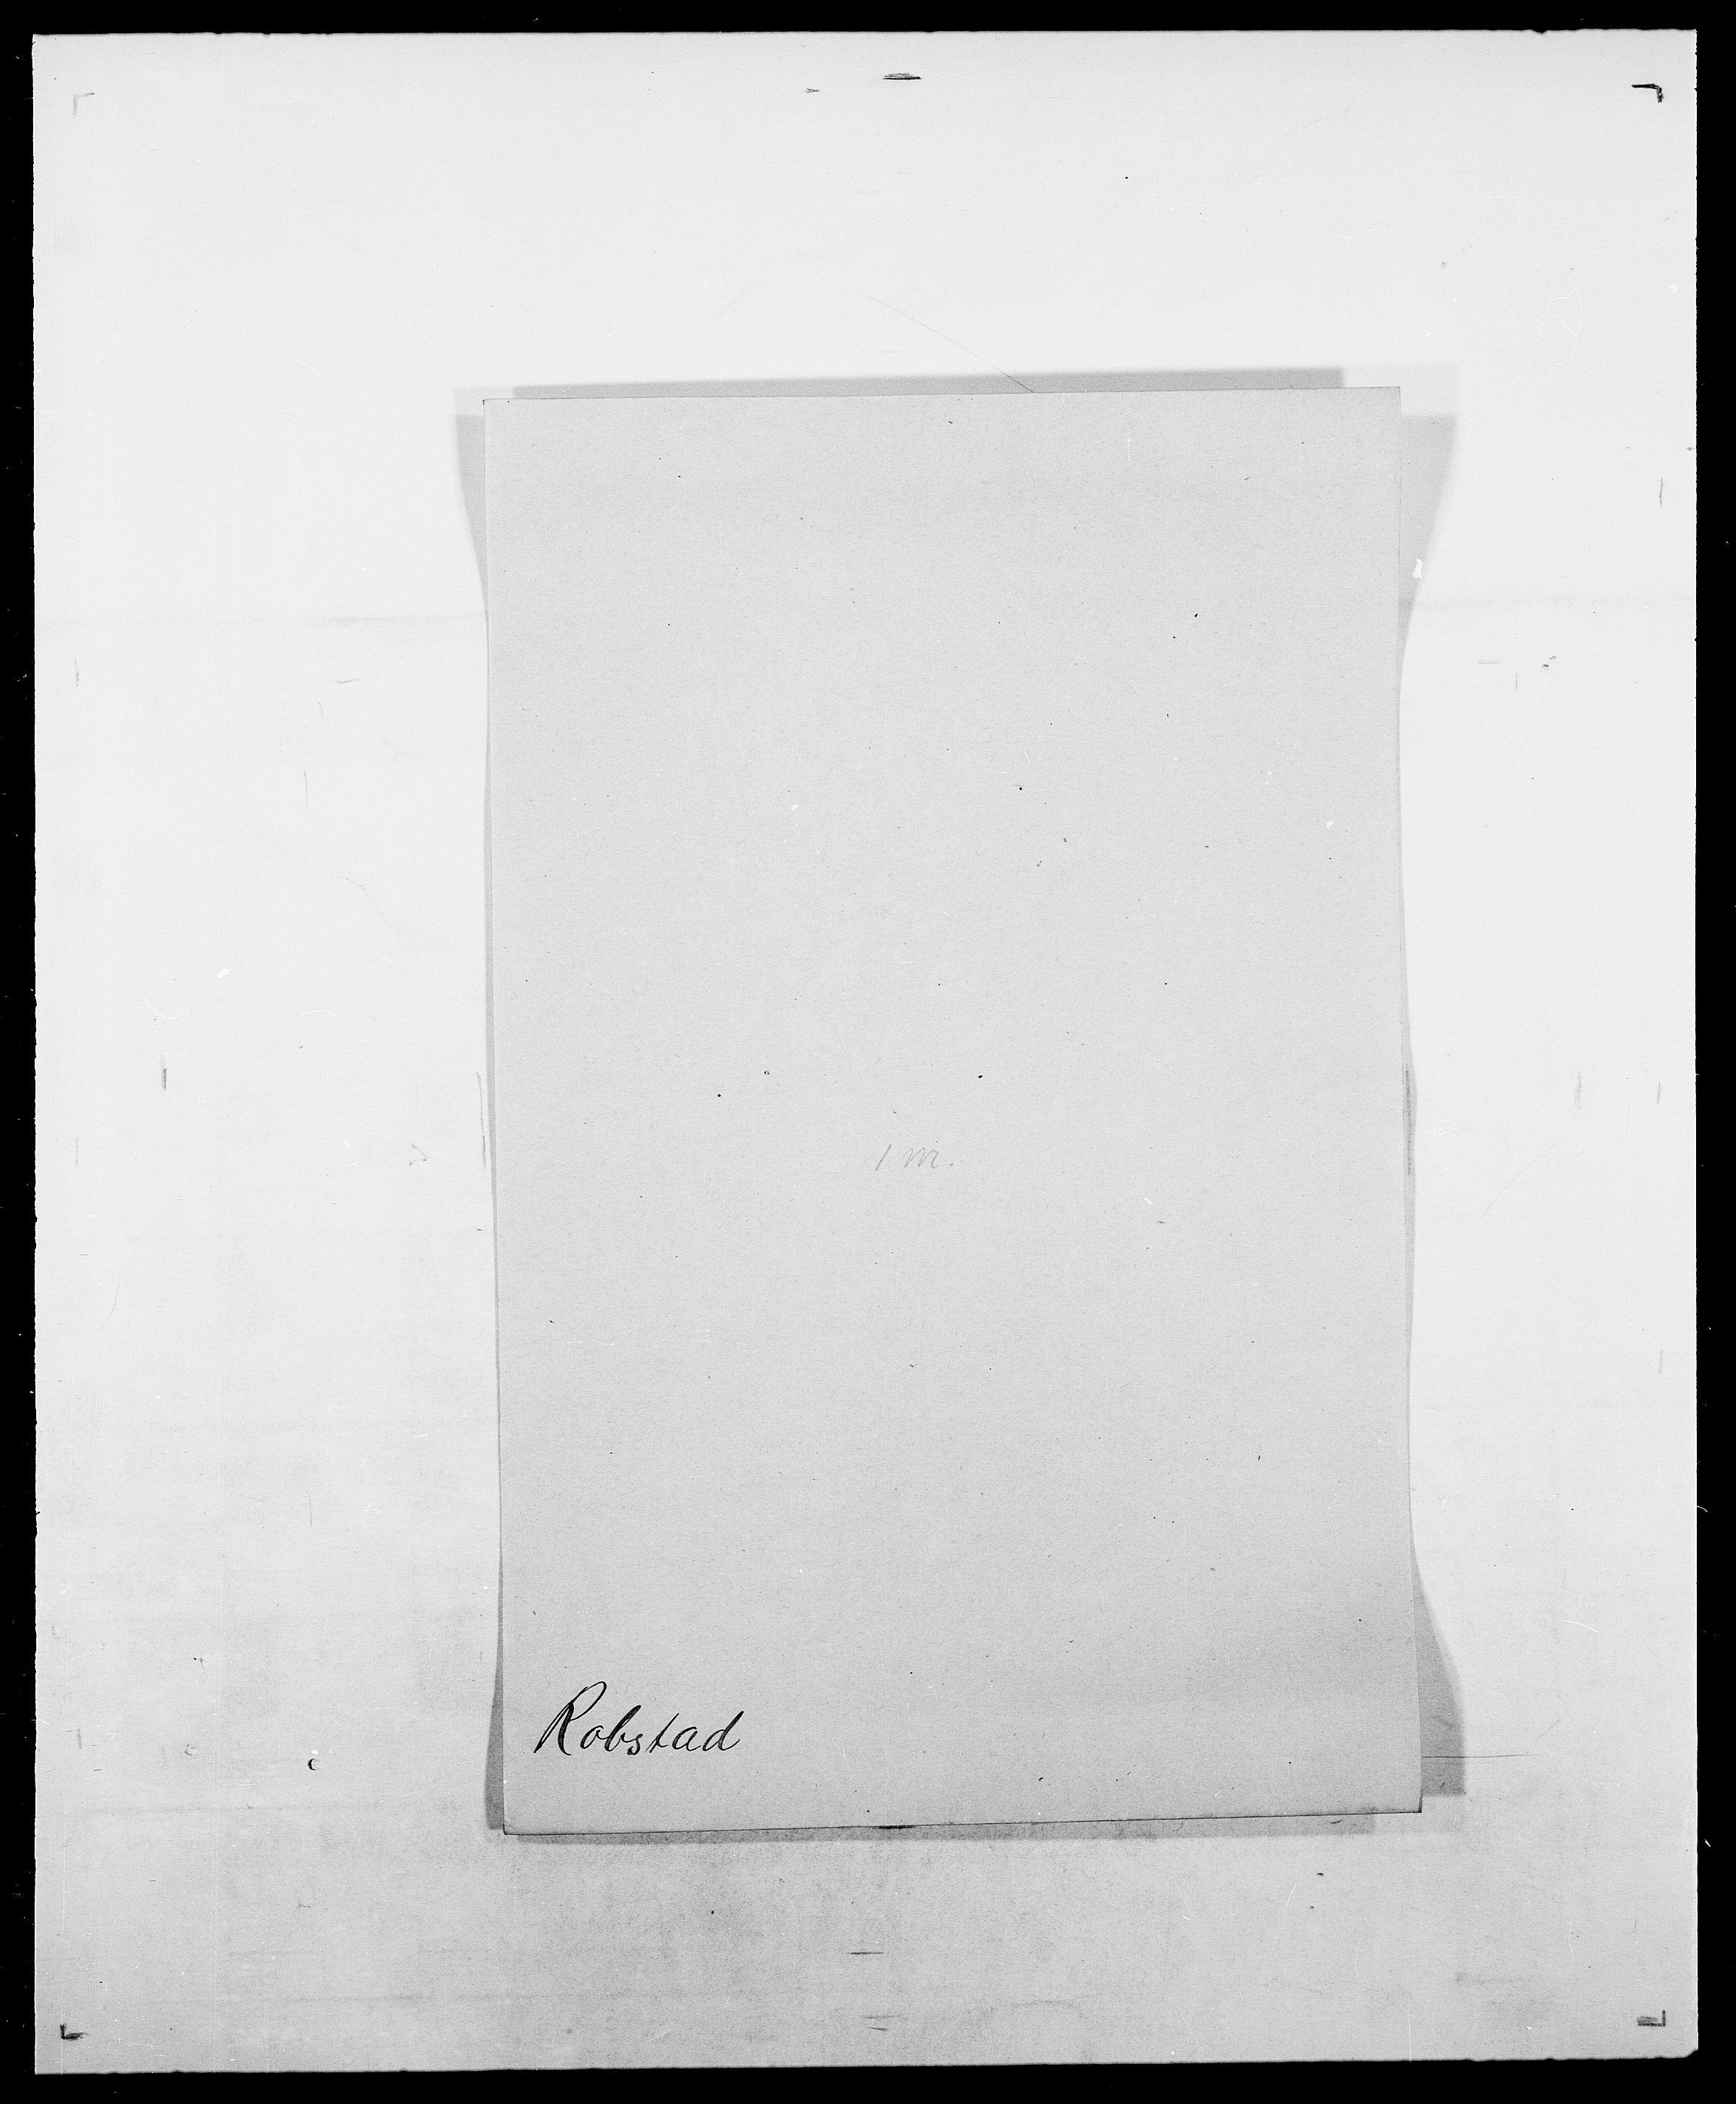 SAO, Delgobe, Charles Antoine - samling, D/Da/L0033: Roald - Røyem, s. 9